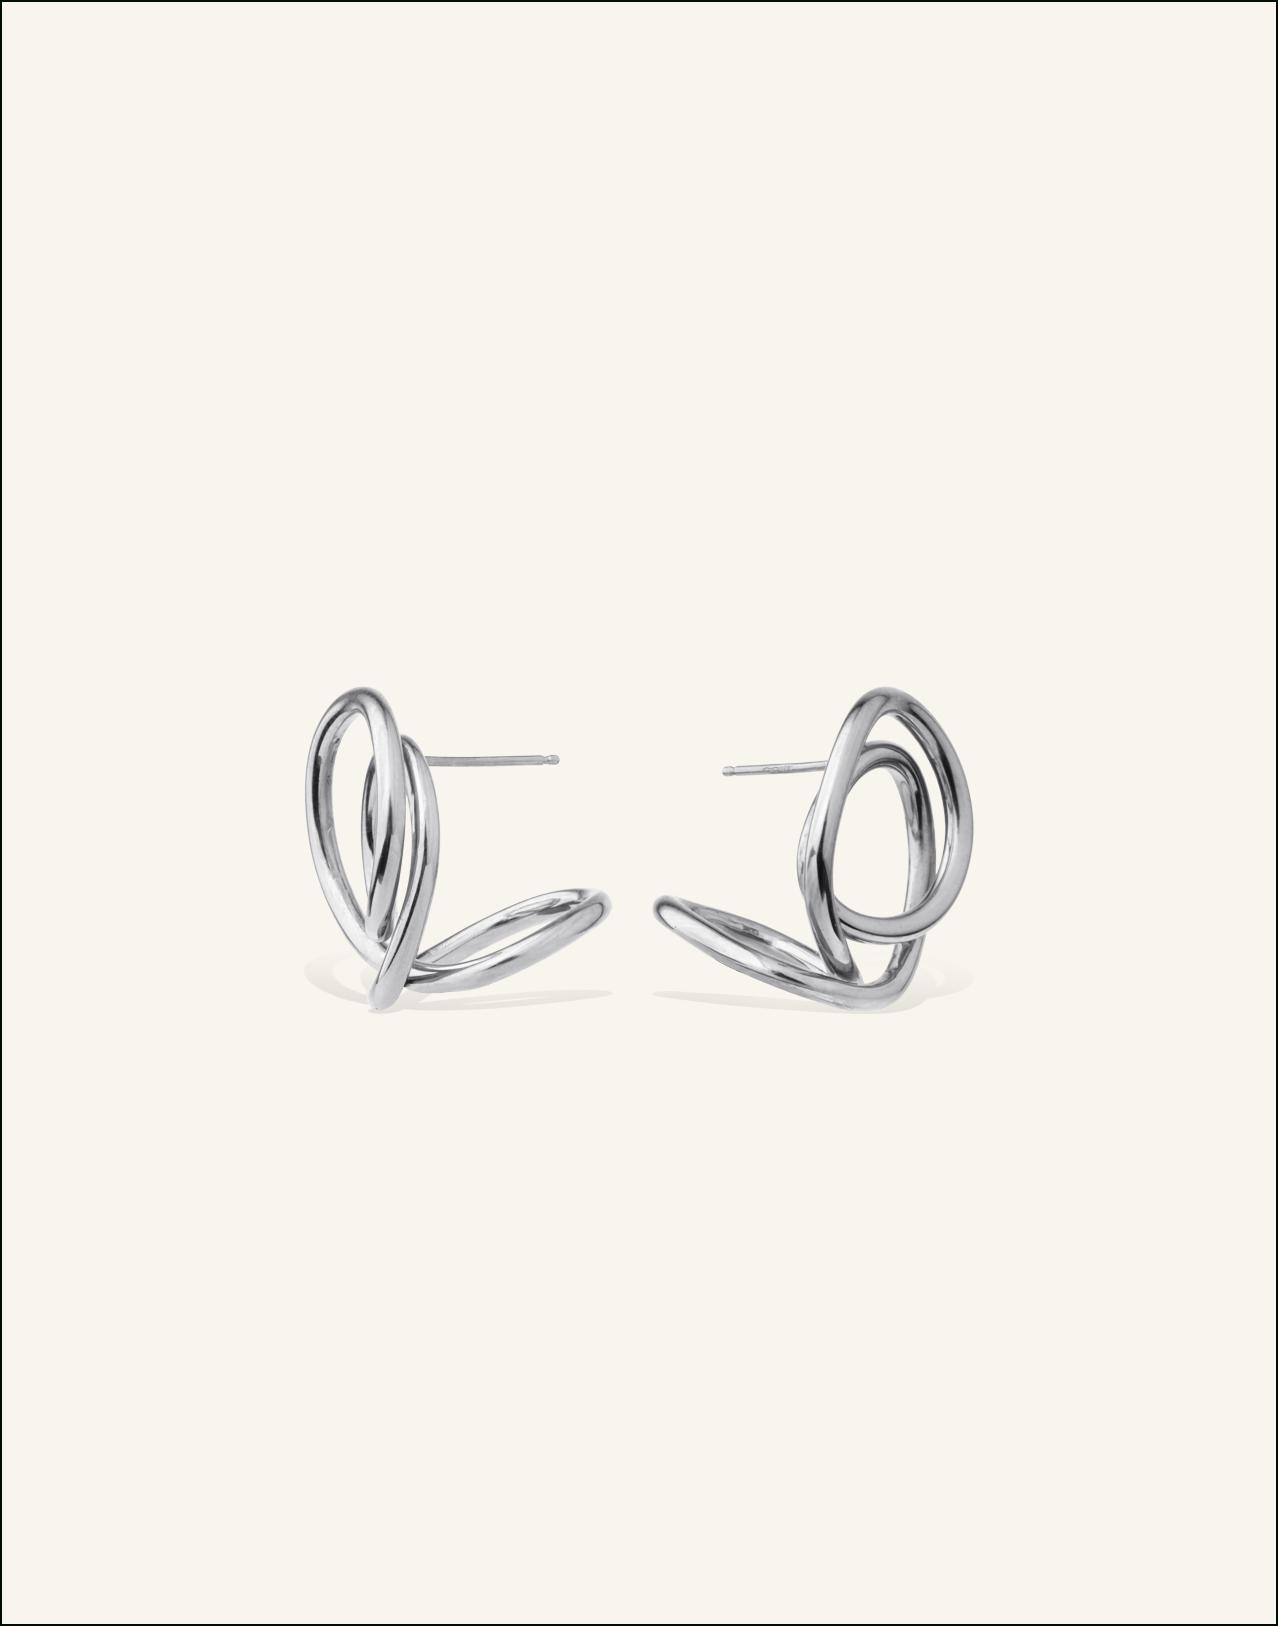 Completedworks-Silver-Earrings-The-Philosopher-2-1.jpg